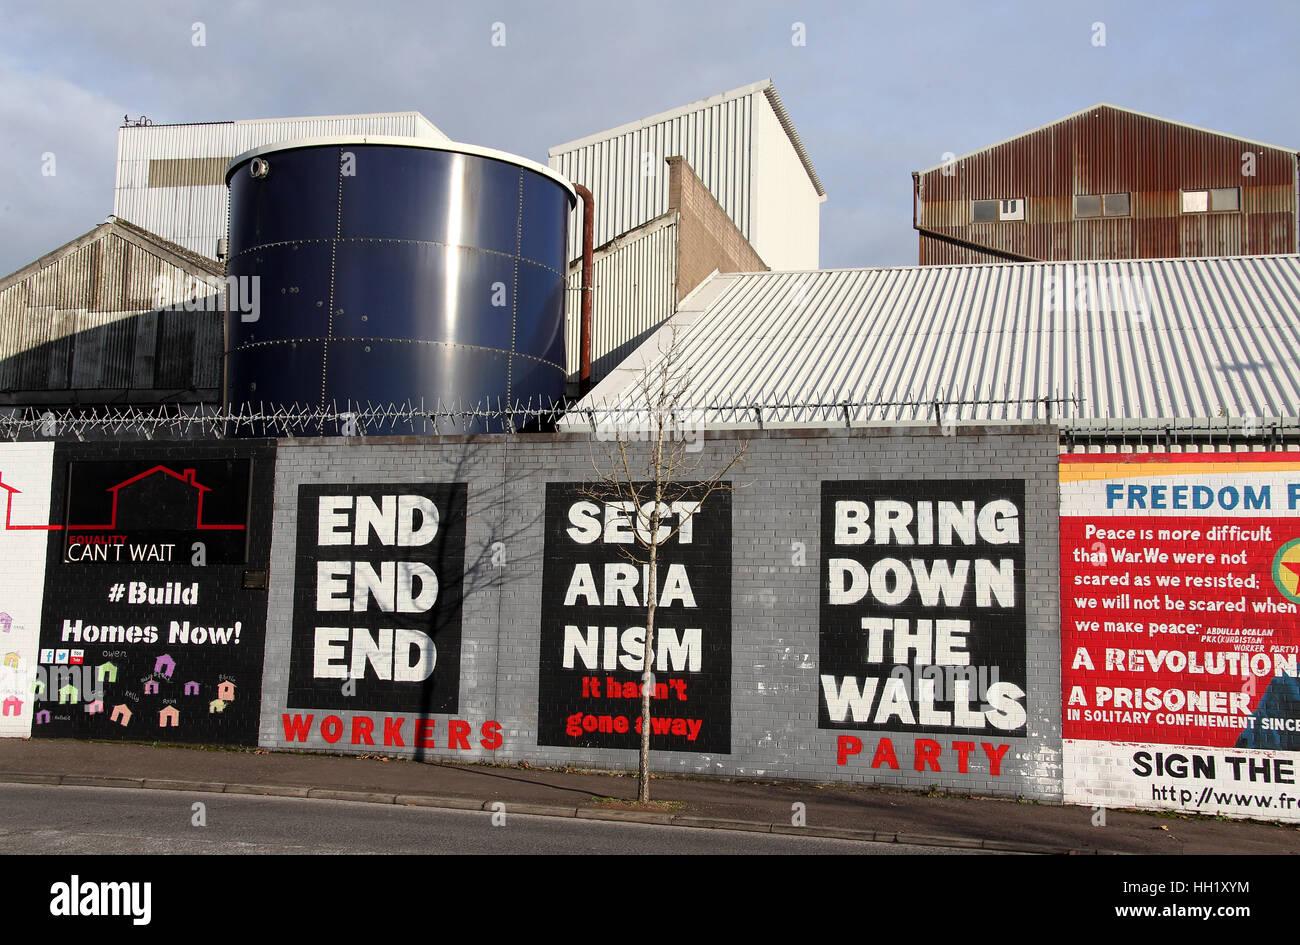 International Peace Wall in Belfast - Stock Image